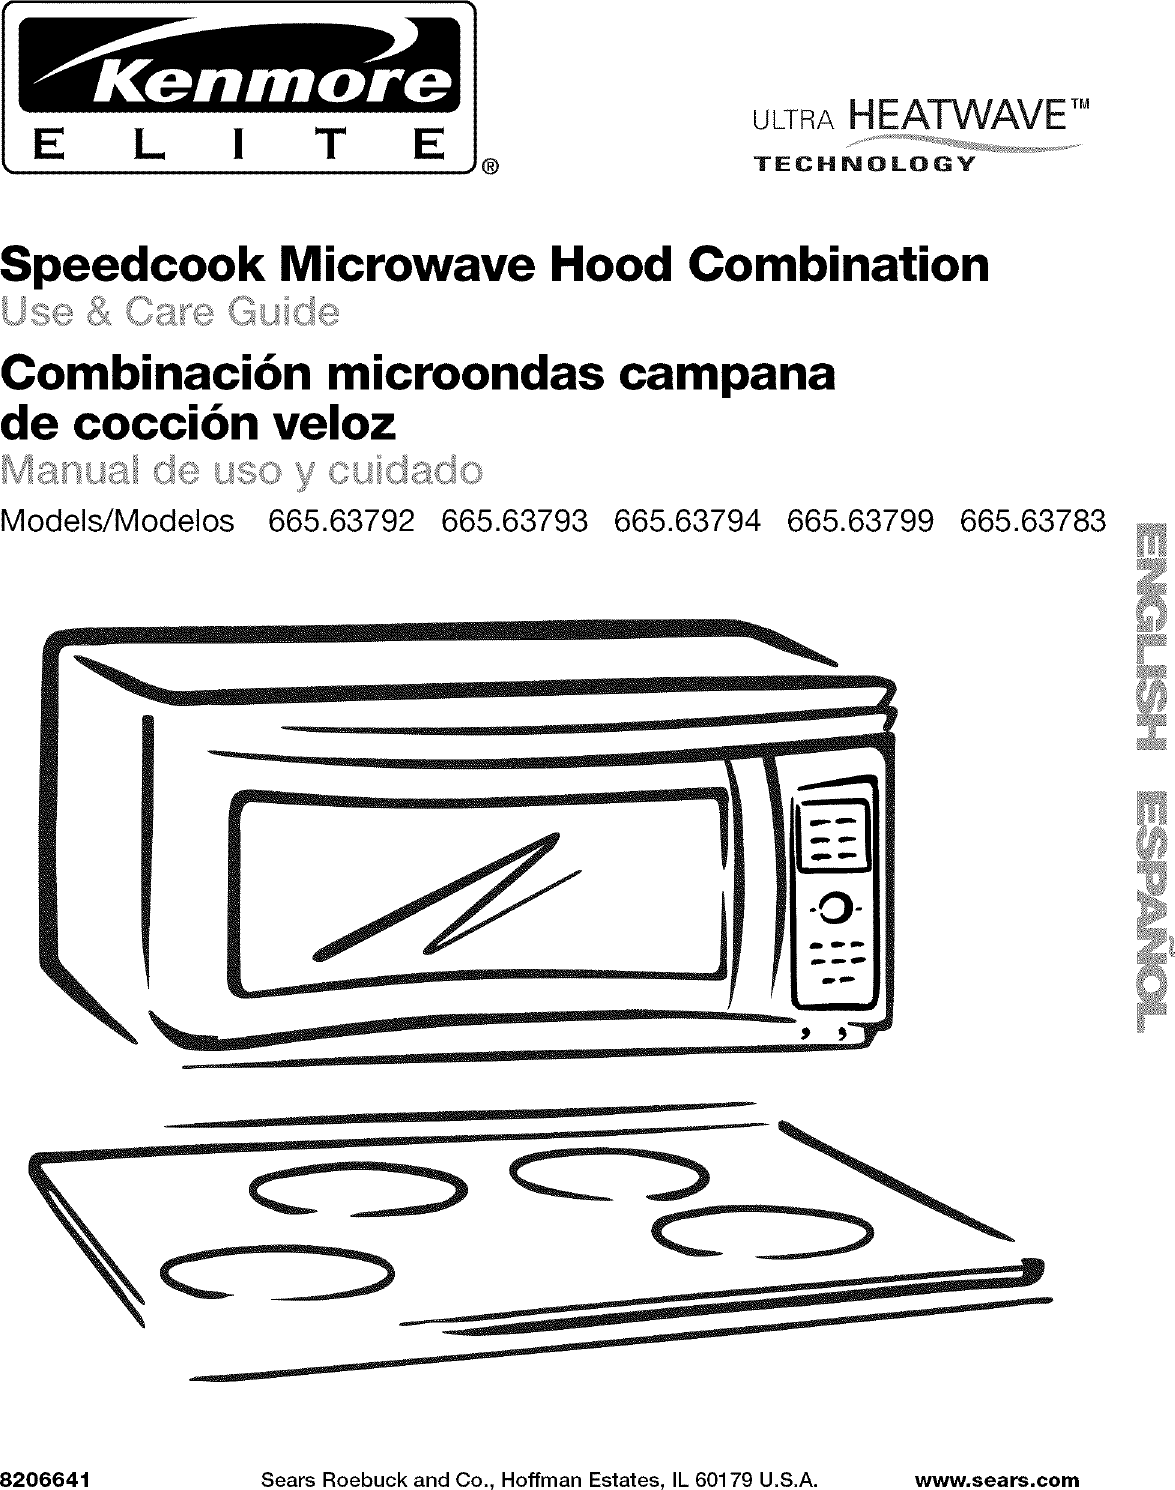 Kenmore Elite 66563792305 User Manual Microwave Hood Combo